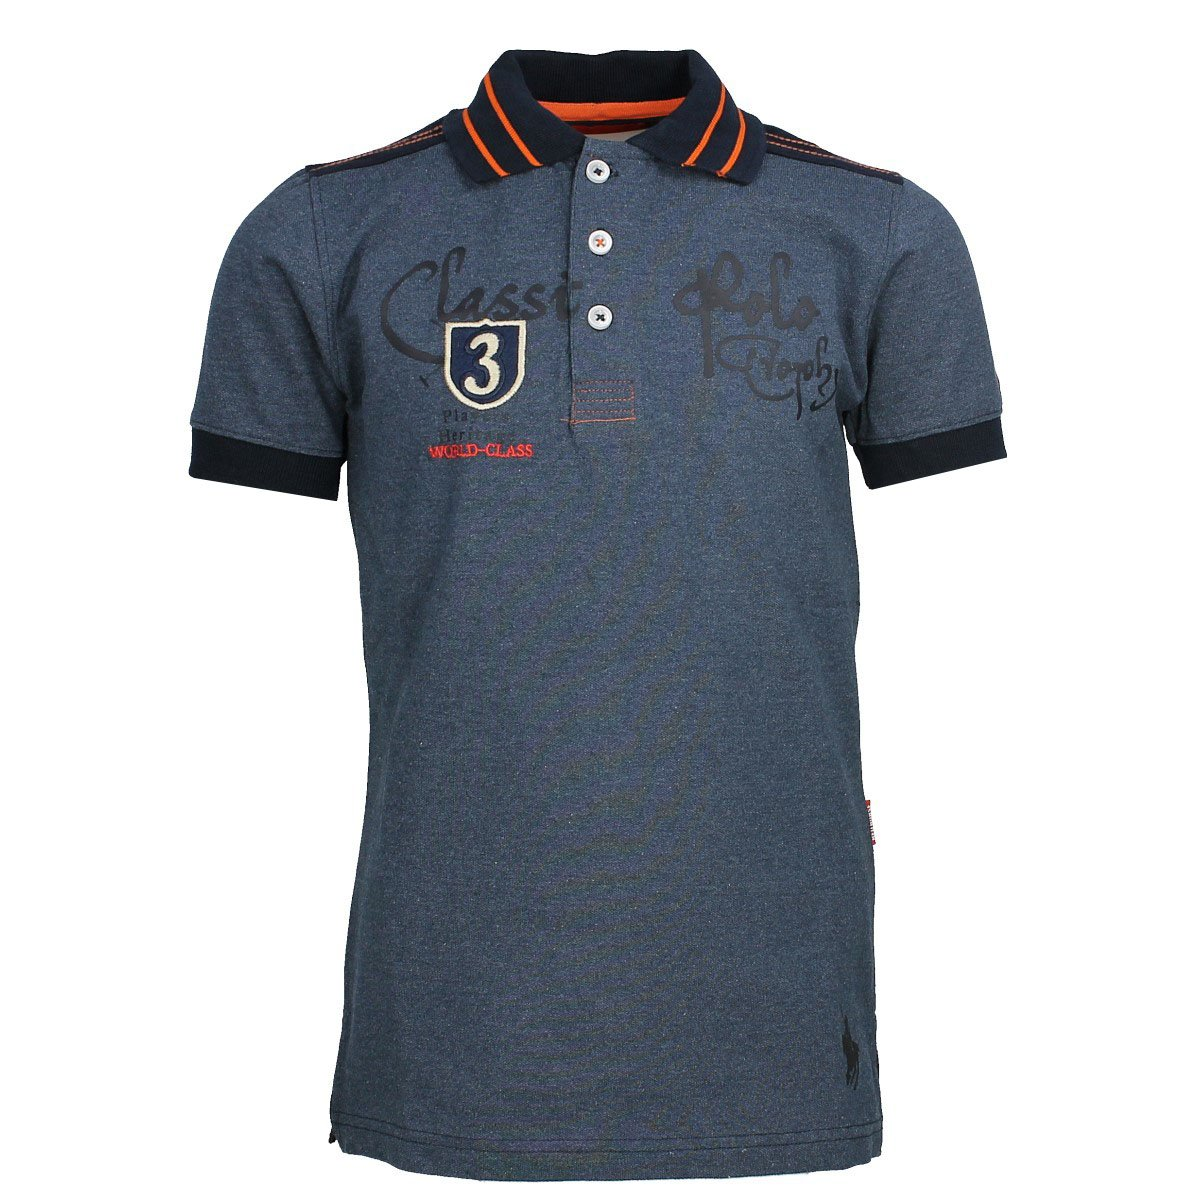 Horka Luka Childrens Polo Shirt - Denim Blue Horka International BV